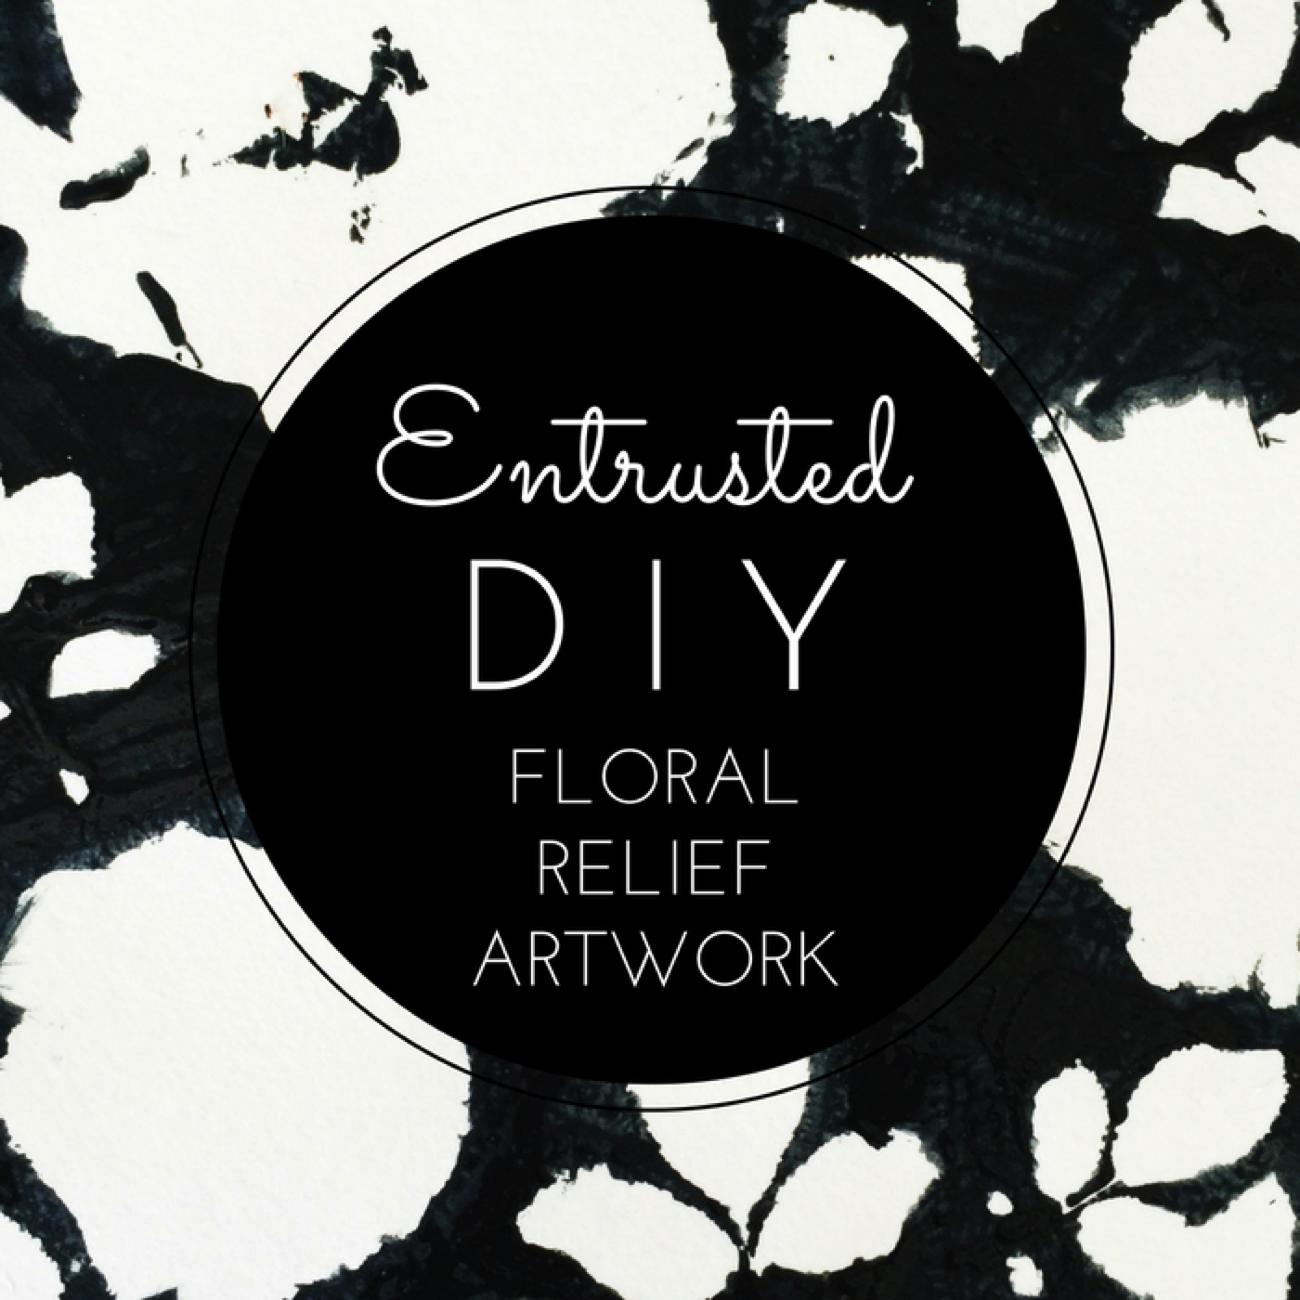 DIY_floral_relief.png